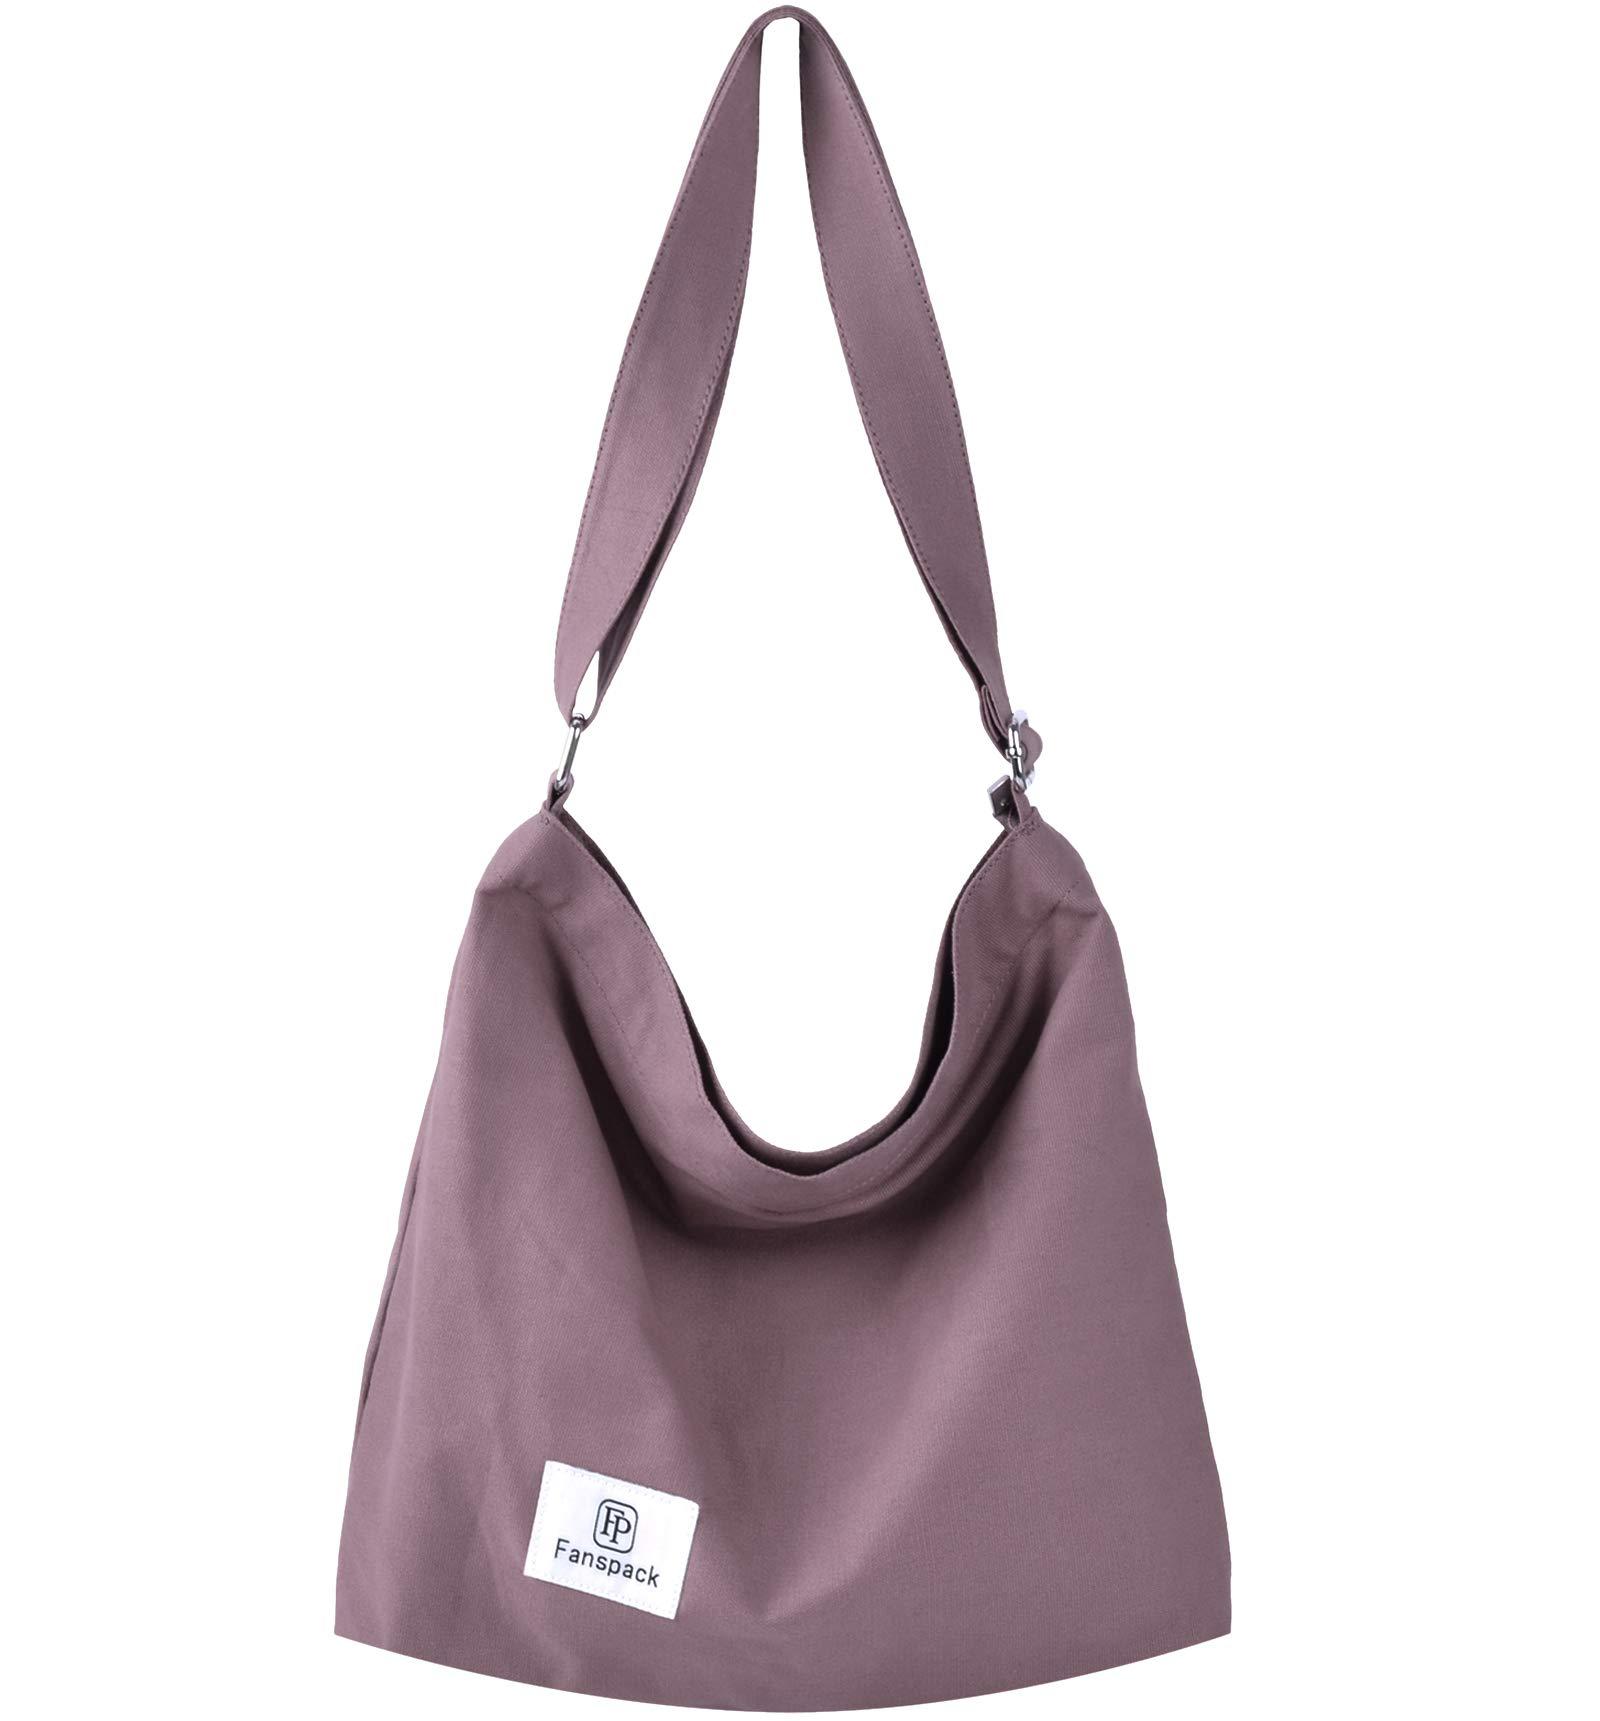 Fanspack Women's Canvas Hobo Handbags Simple Casual Top Handle Tote Bag Crossbody Shoulder Bag Shopping Work Bag (Light Purple-Original Design)